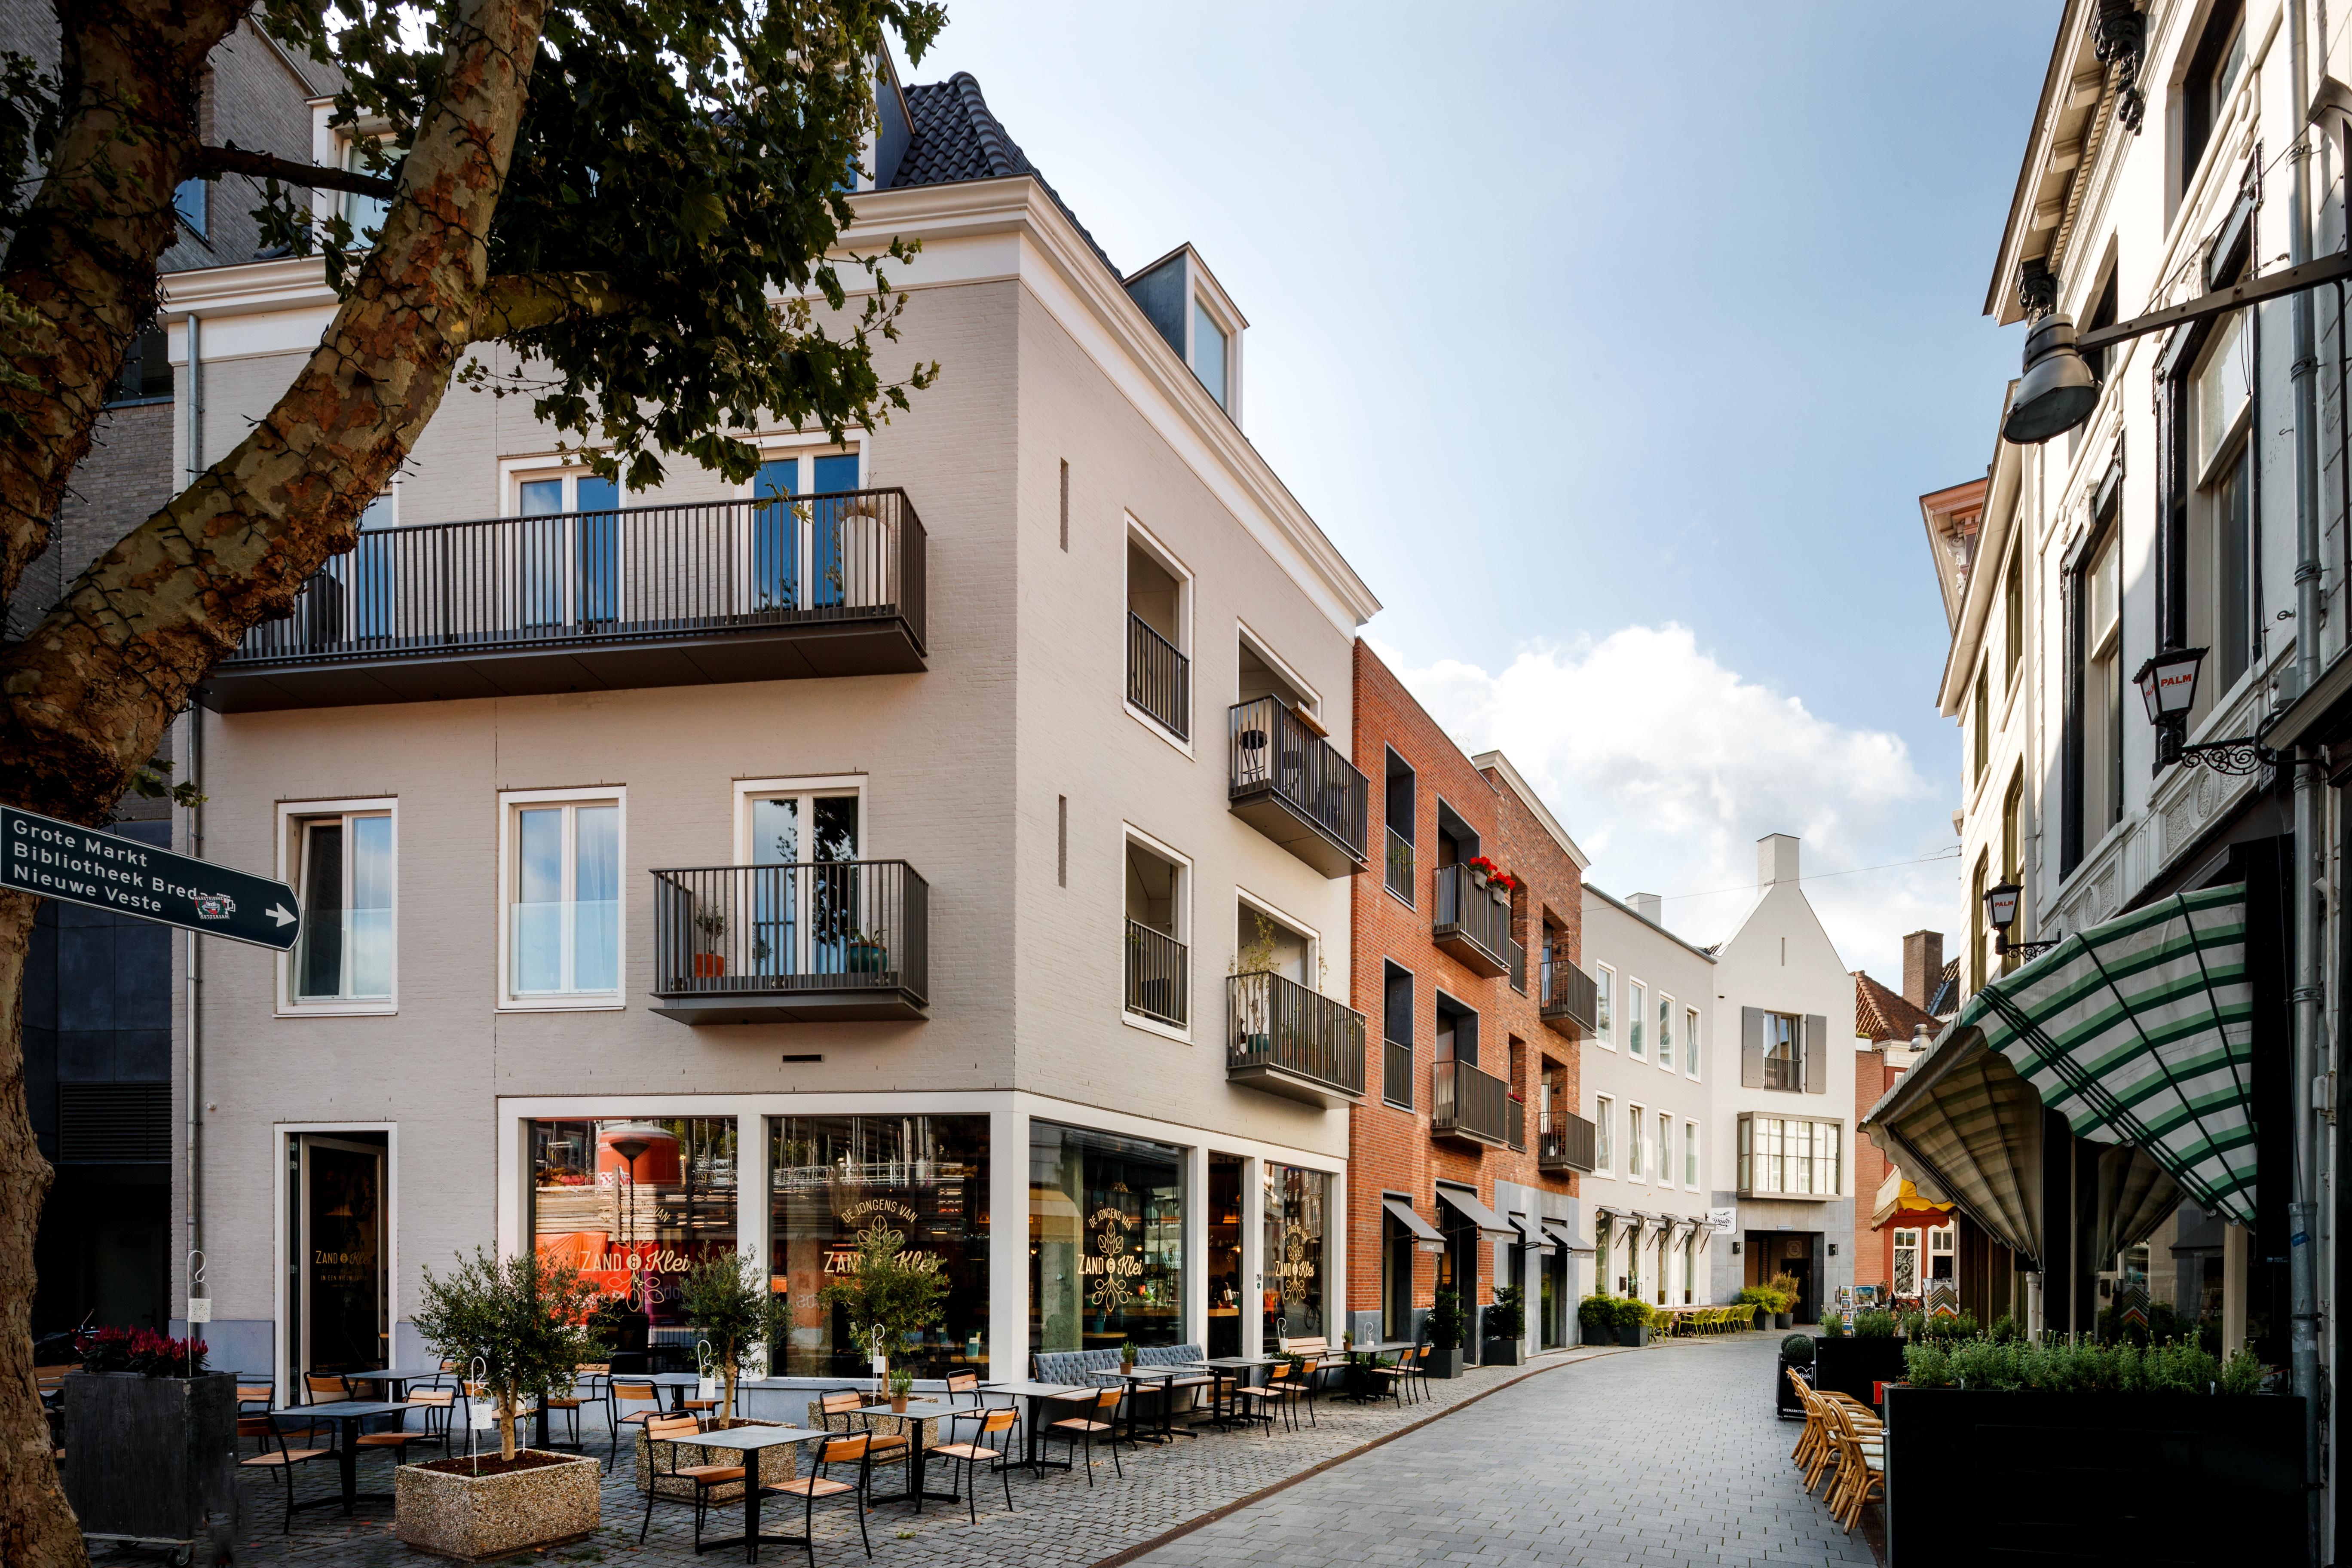 <p>Straatbeeld Veemarktstraat</p>